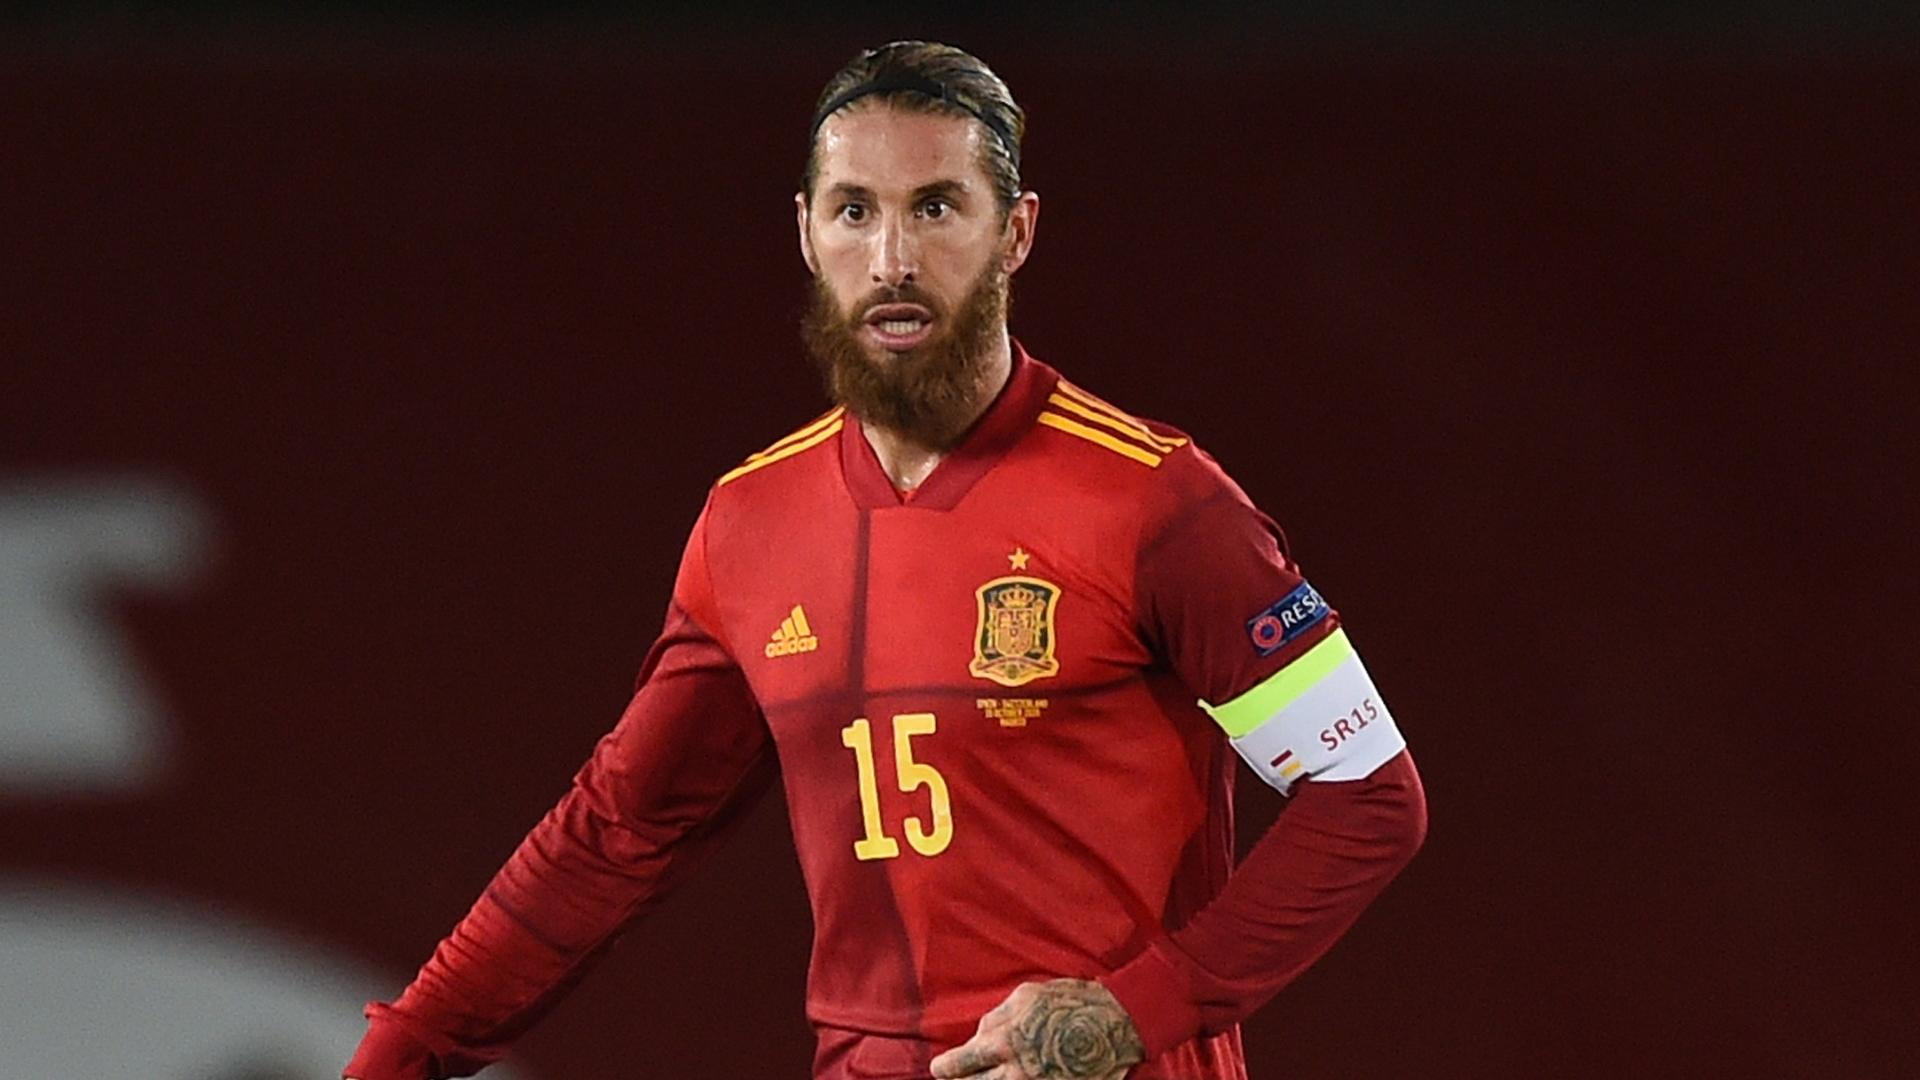 Spain captain Ramos equals Buffon's international record